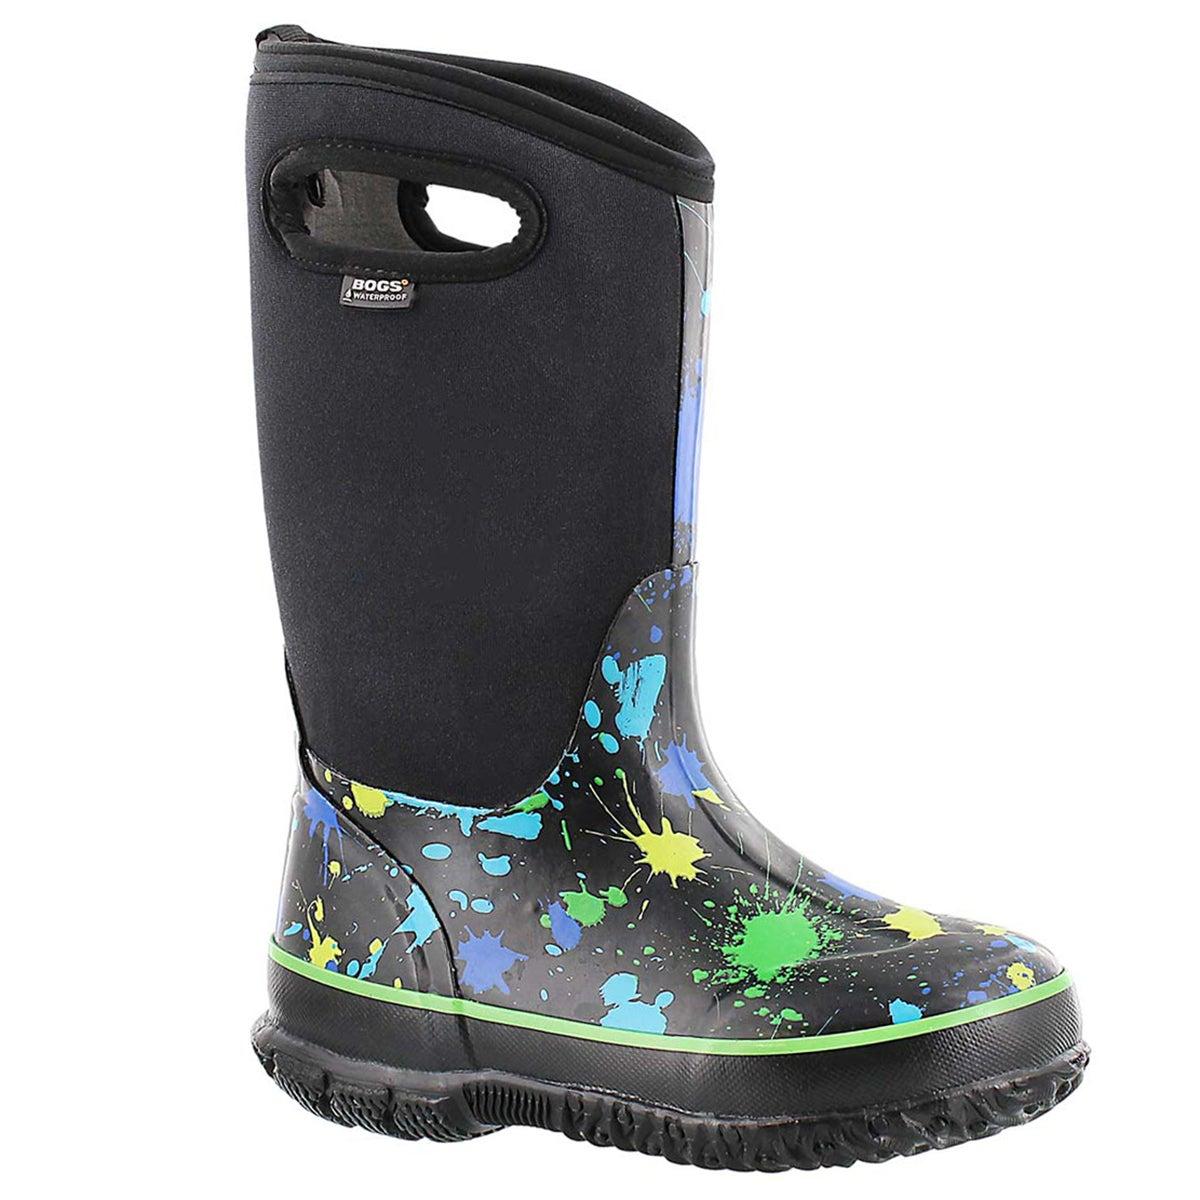 Bys Paint Splat tall blk/blue boot